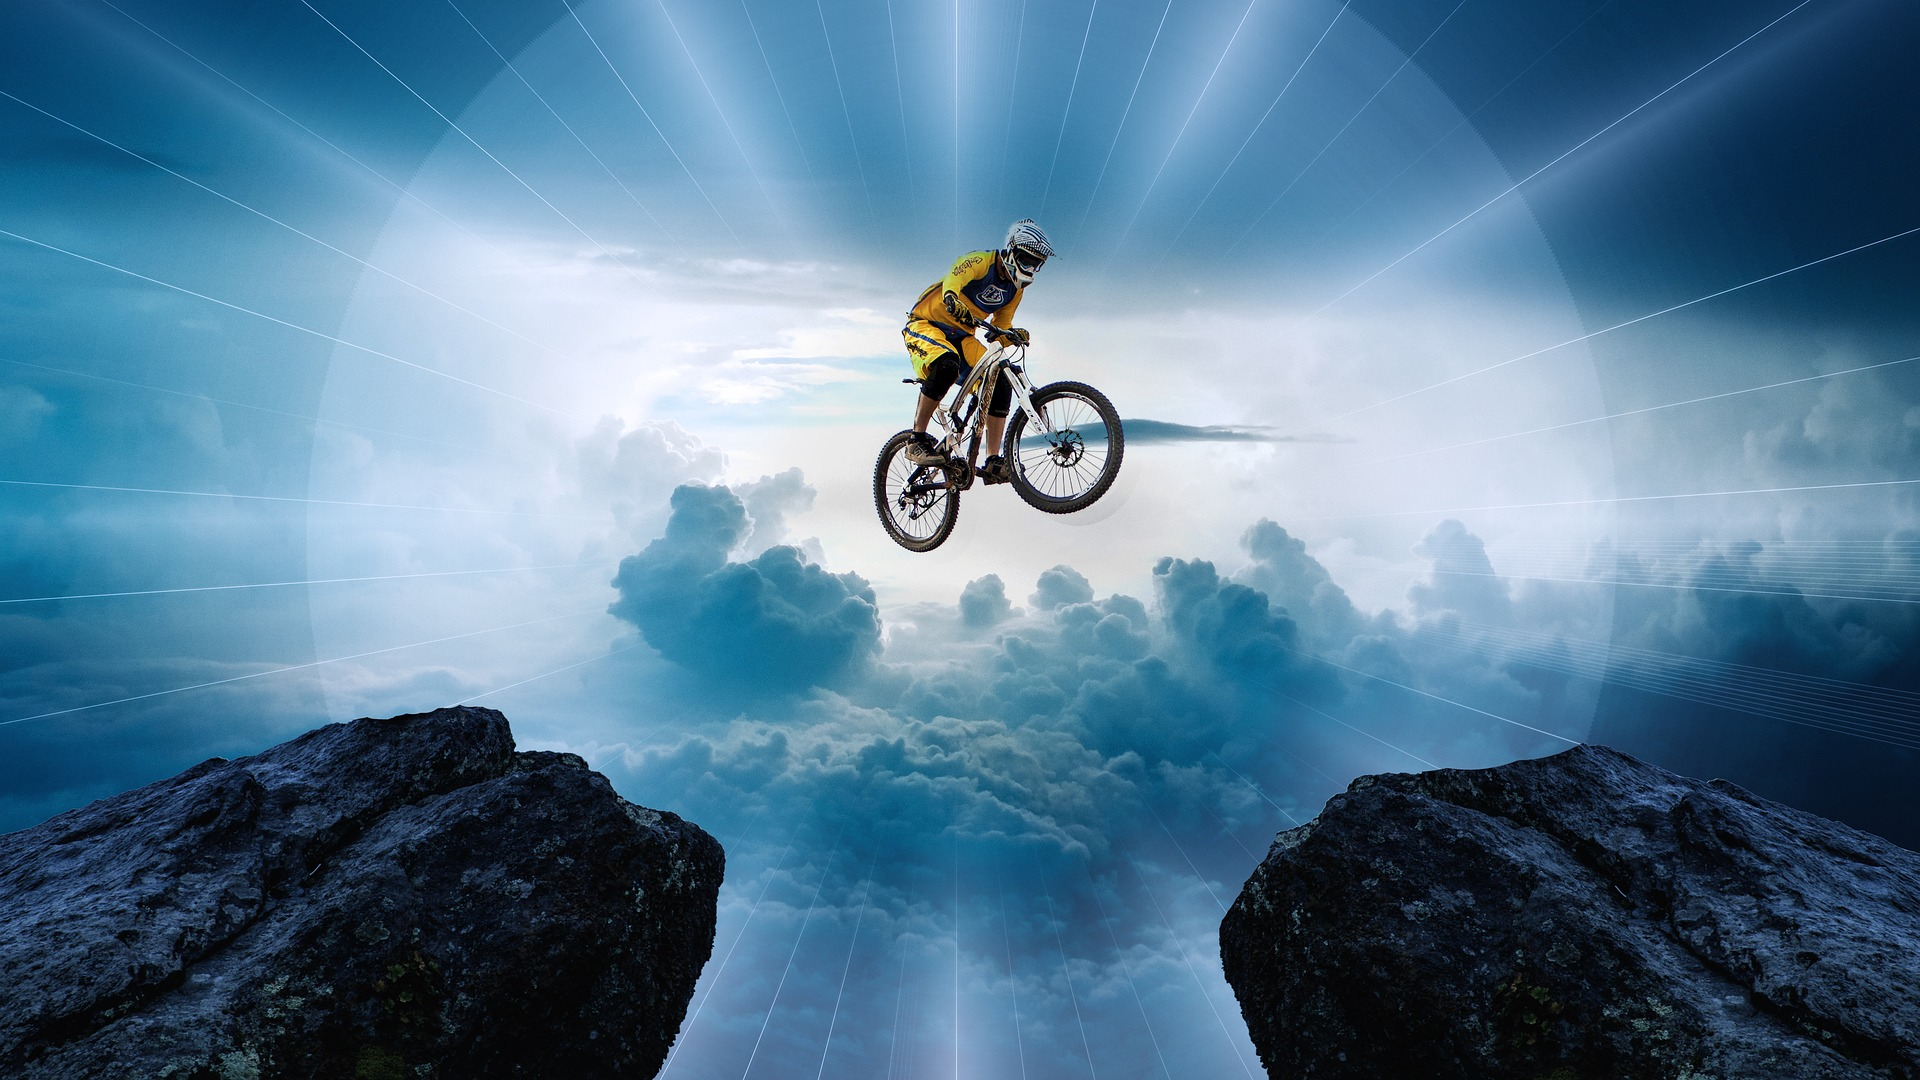 mountain-bike-2706904_1920